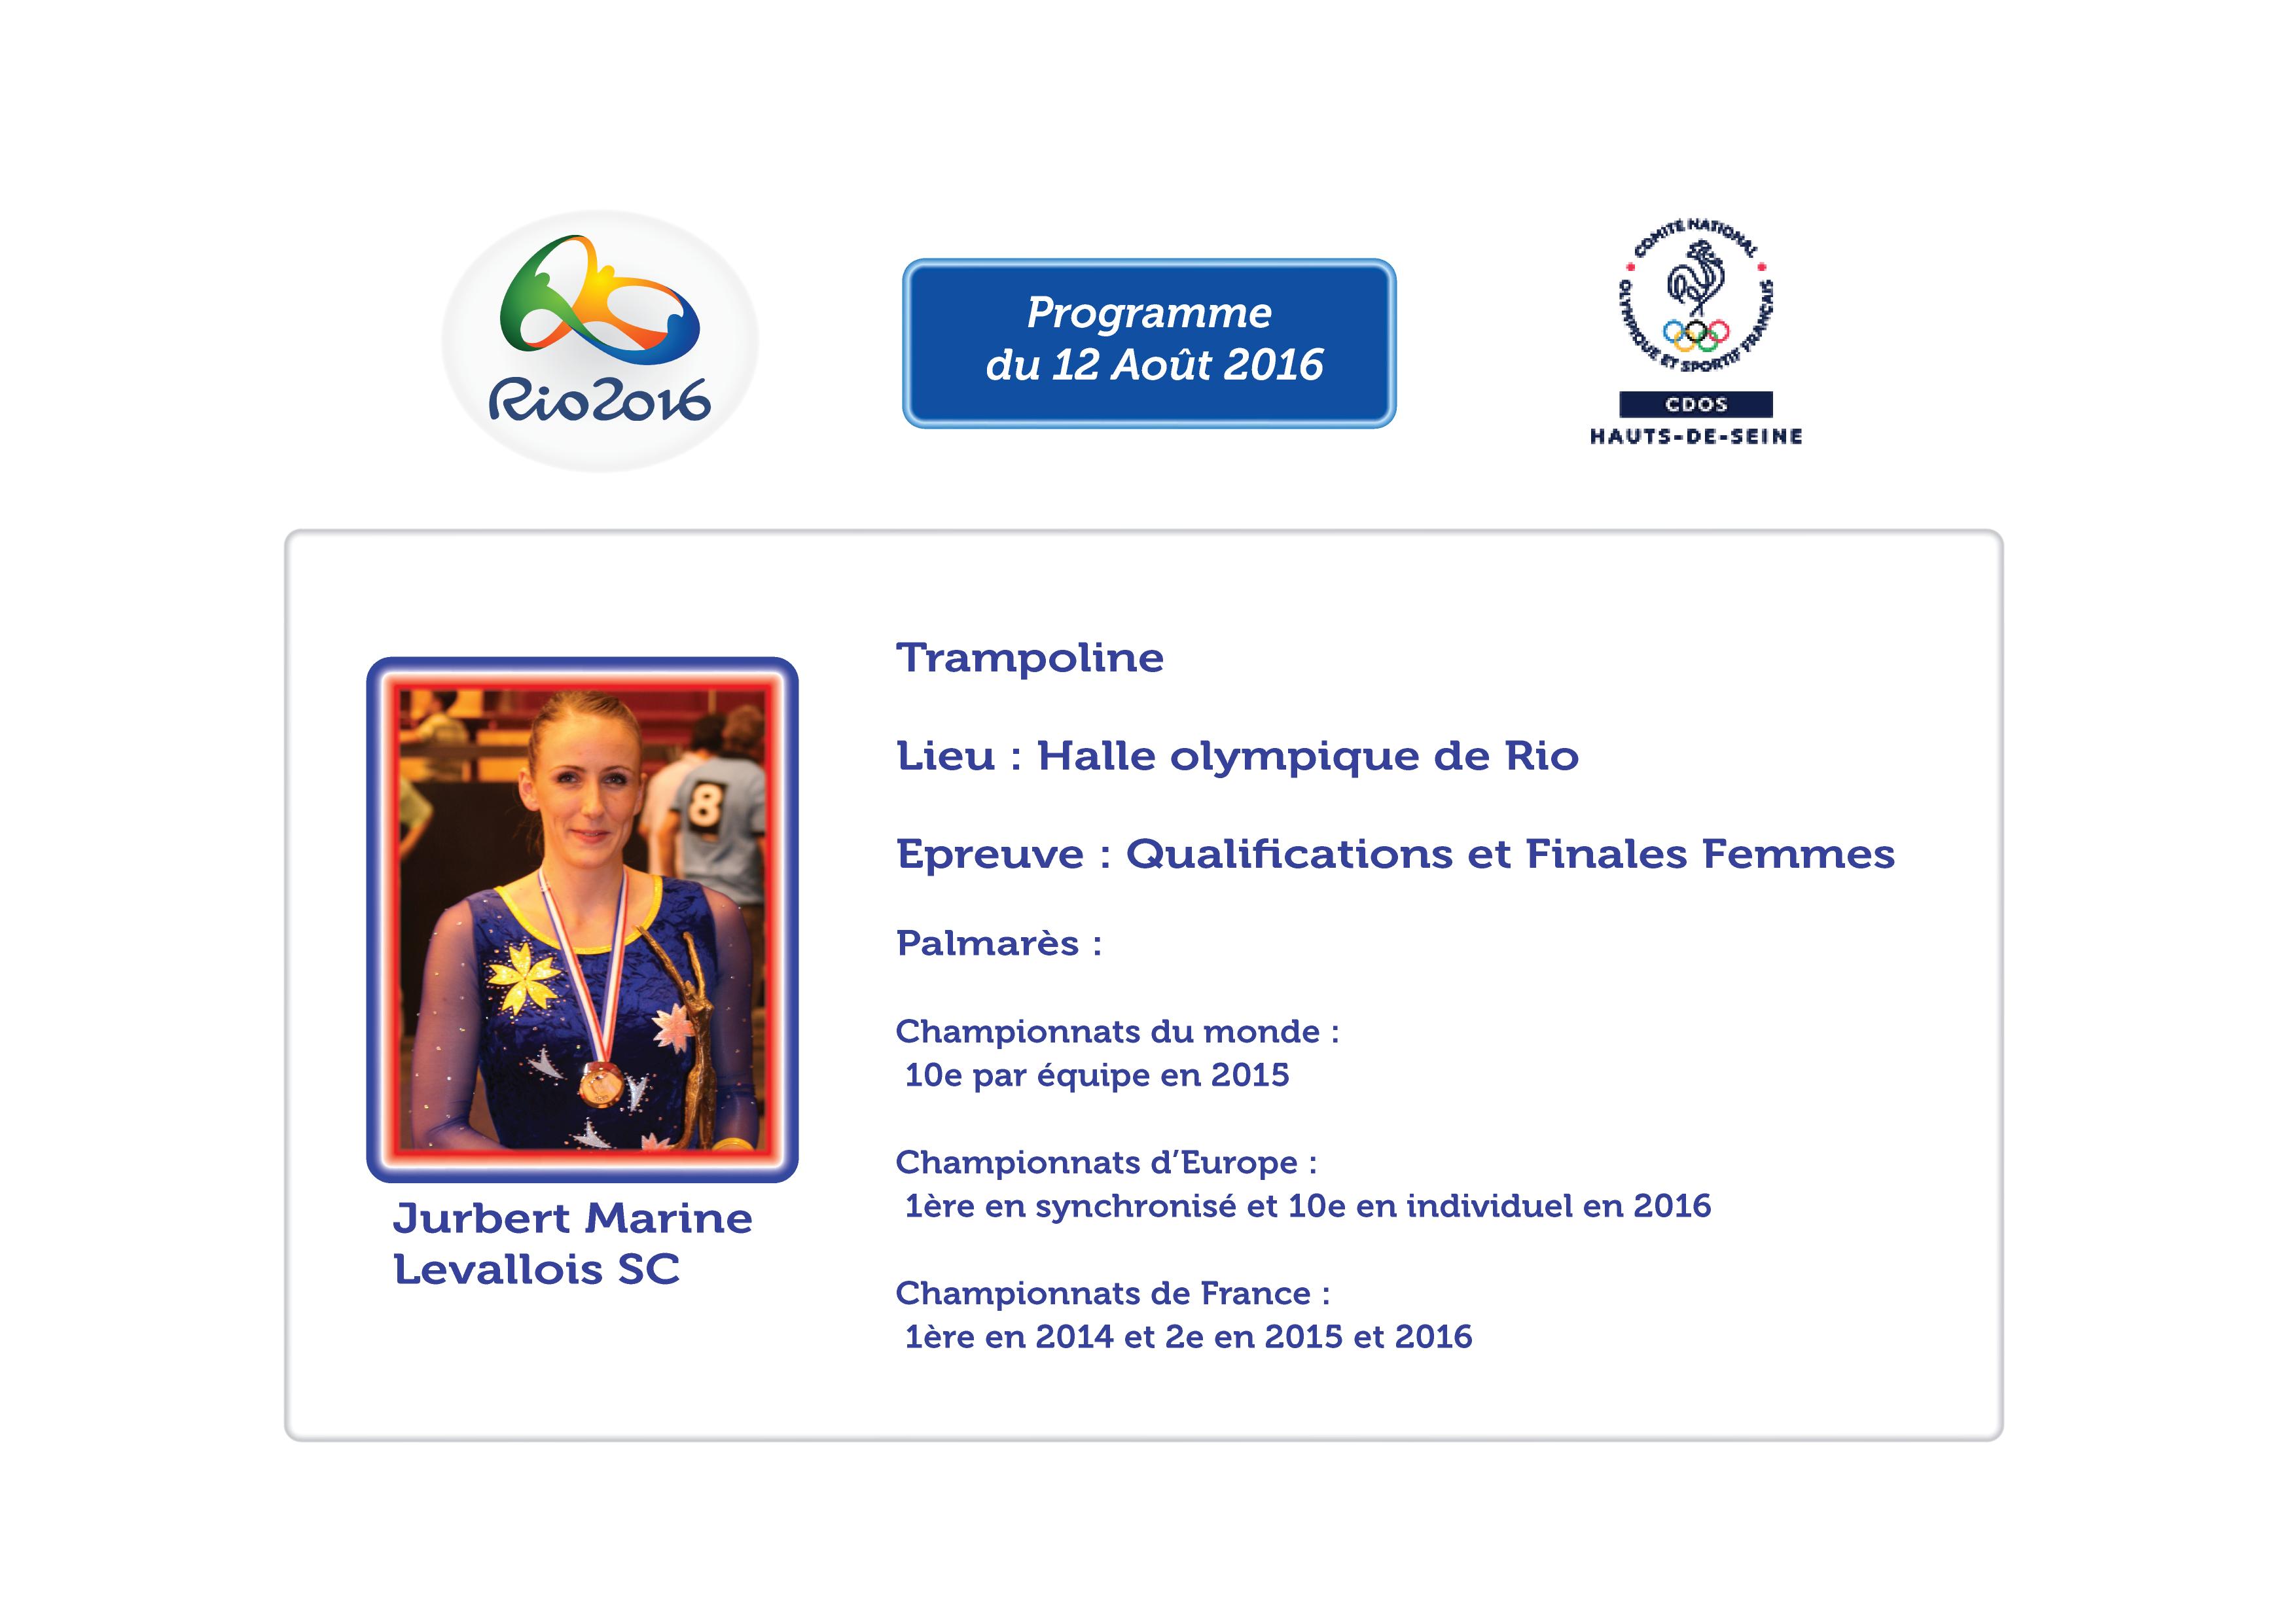 Programme des Athlètes Alto-Sequanais à RIO : 12 Août